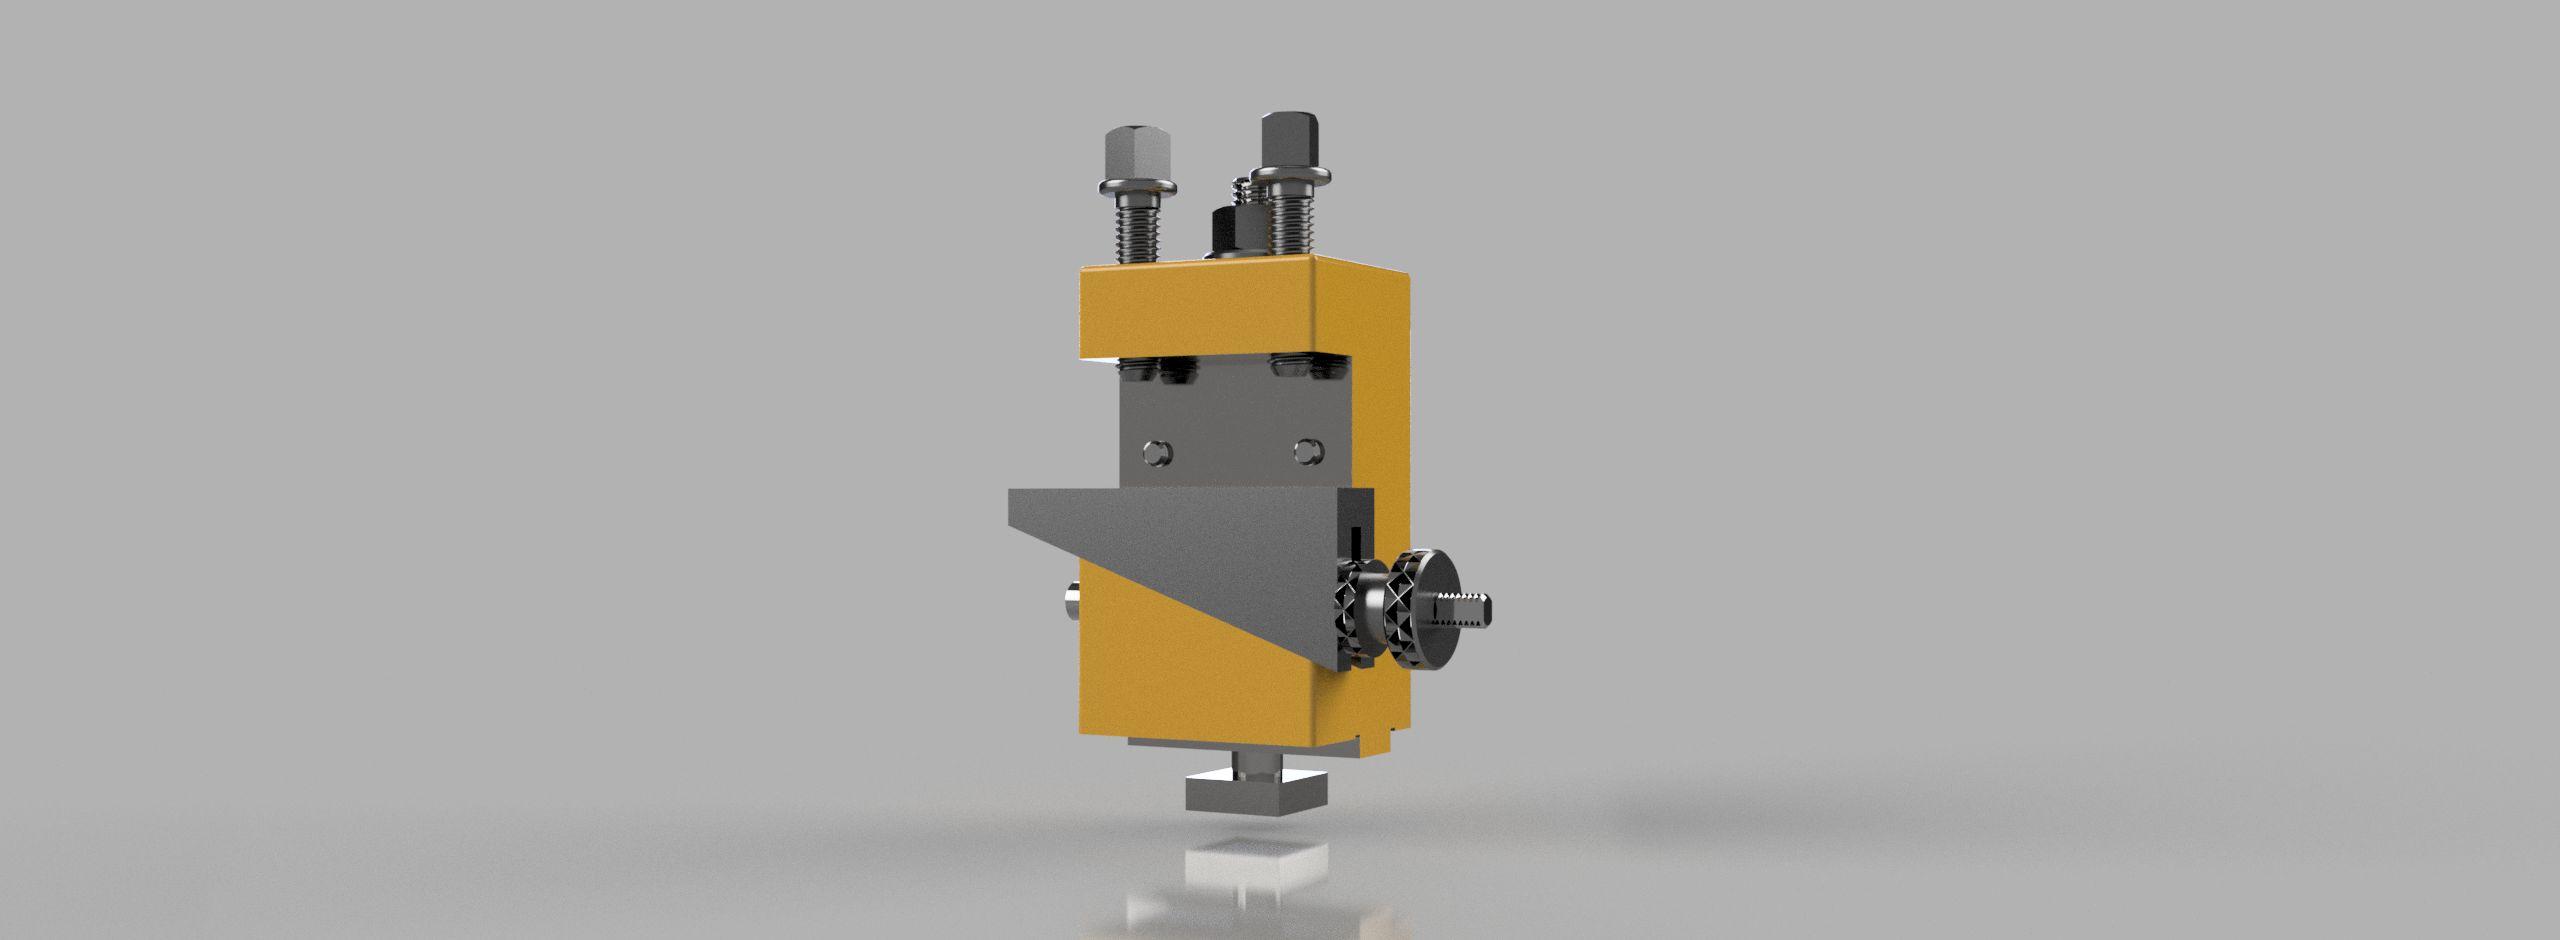 Tool-post-v13-3500-3500